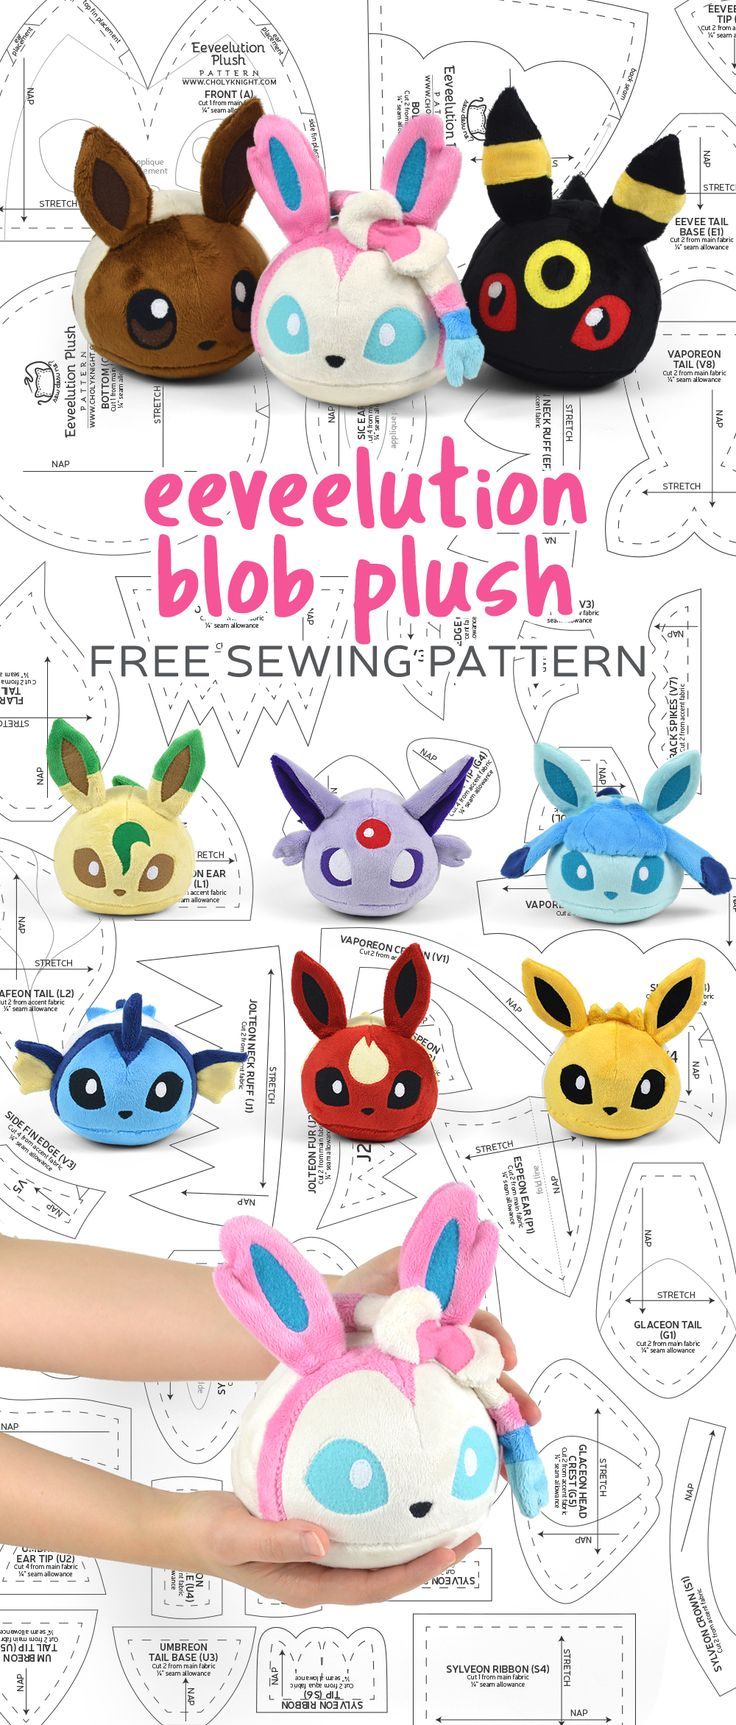 Free Pattern Friday! Eeveelution Blob Plush